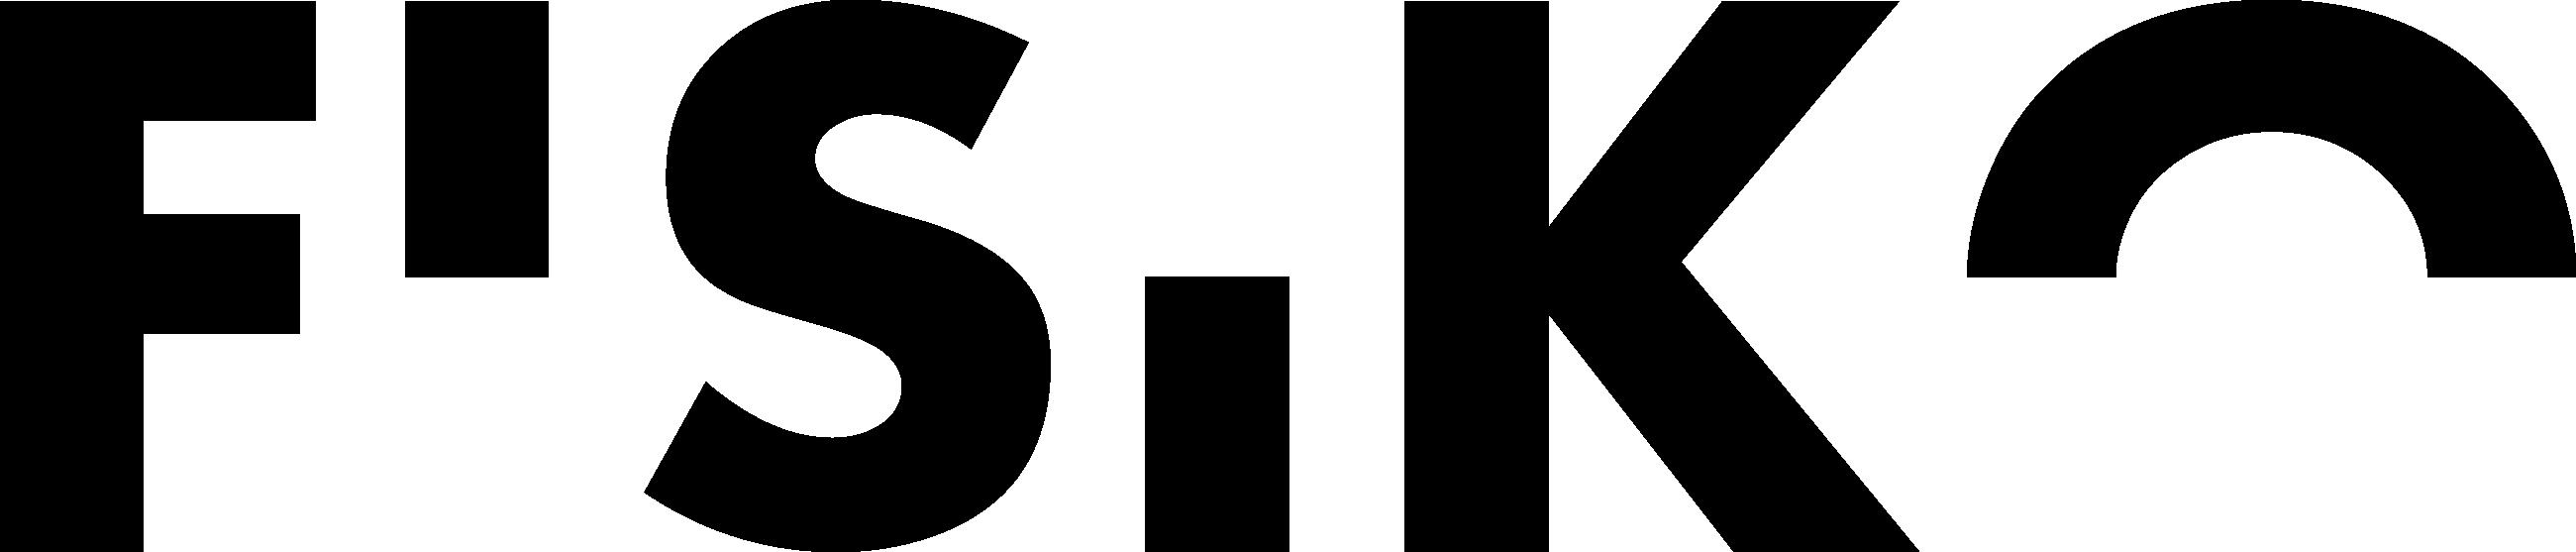 black-PNG